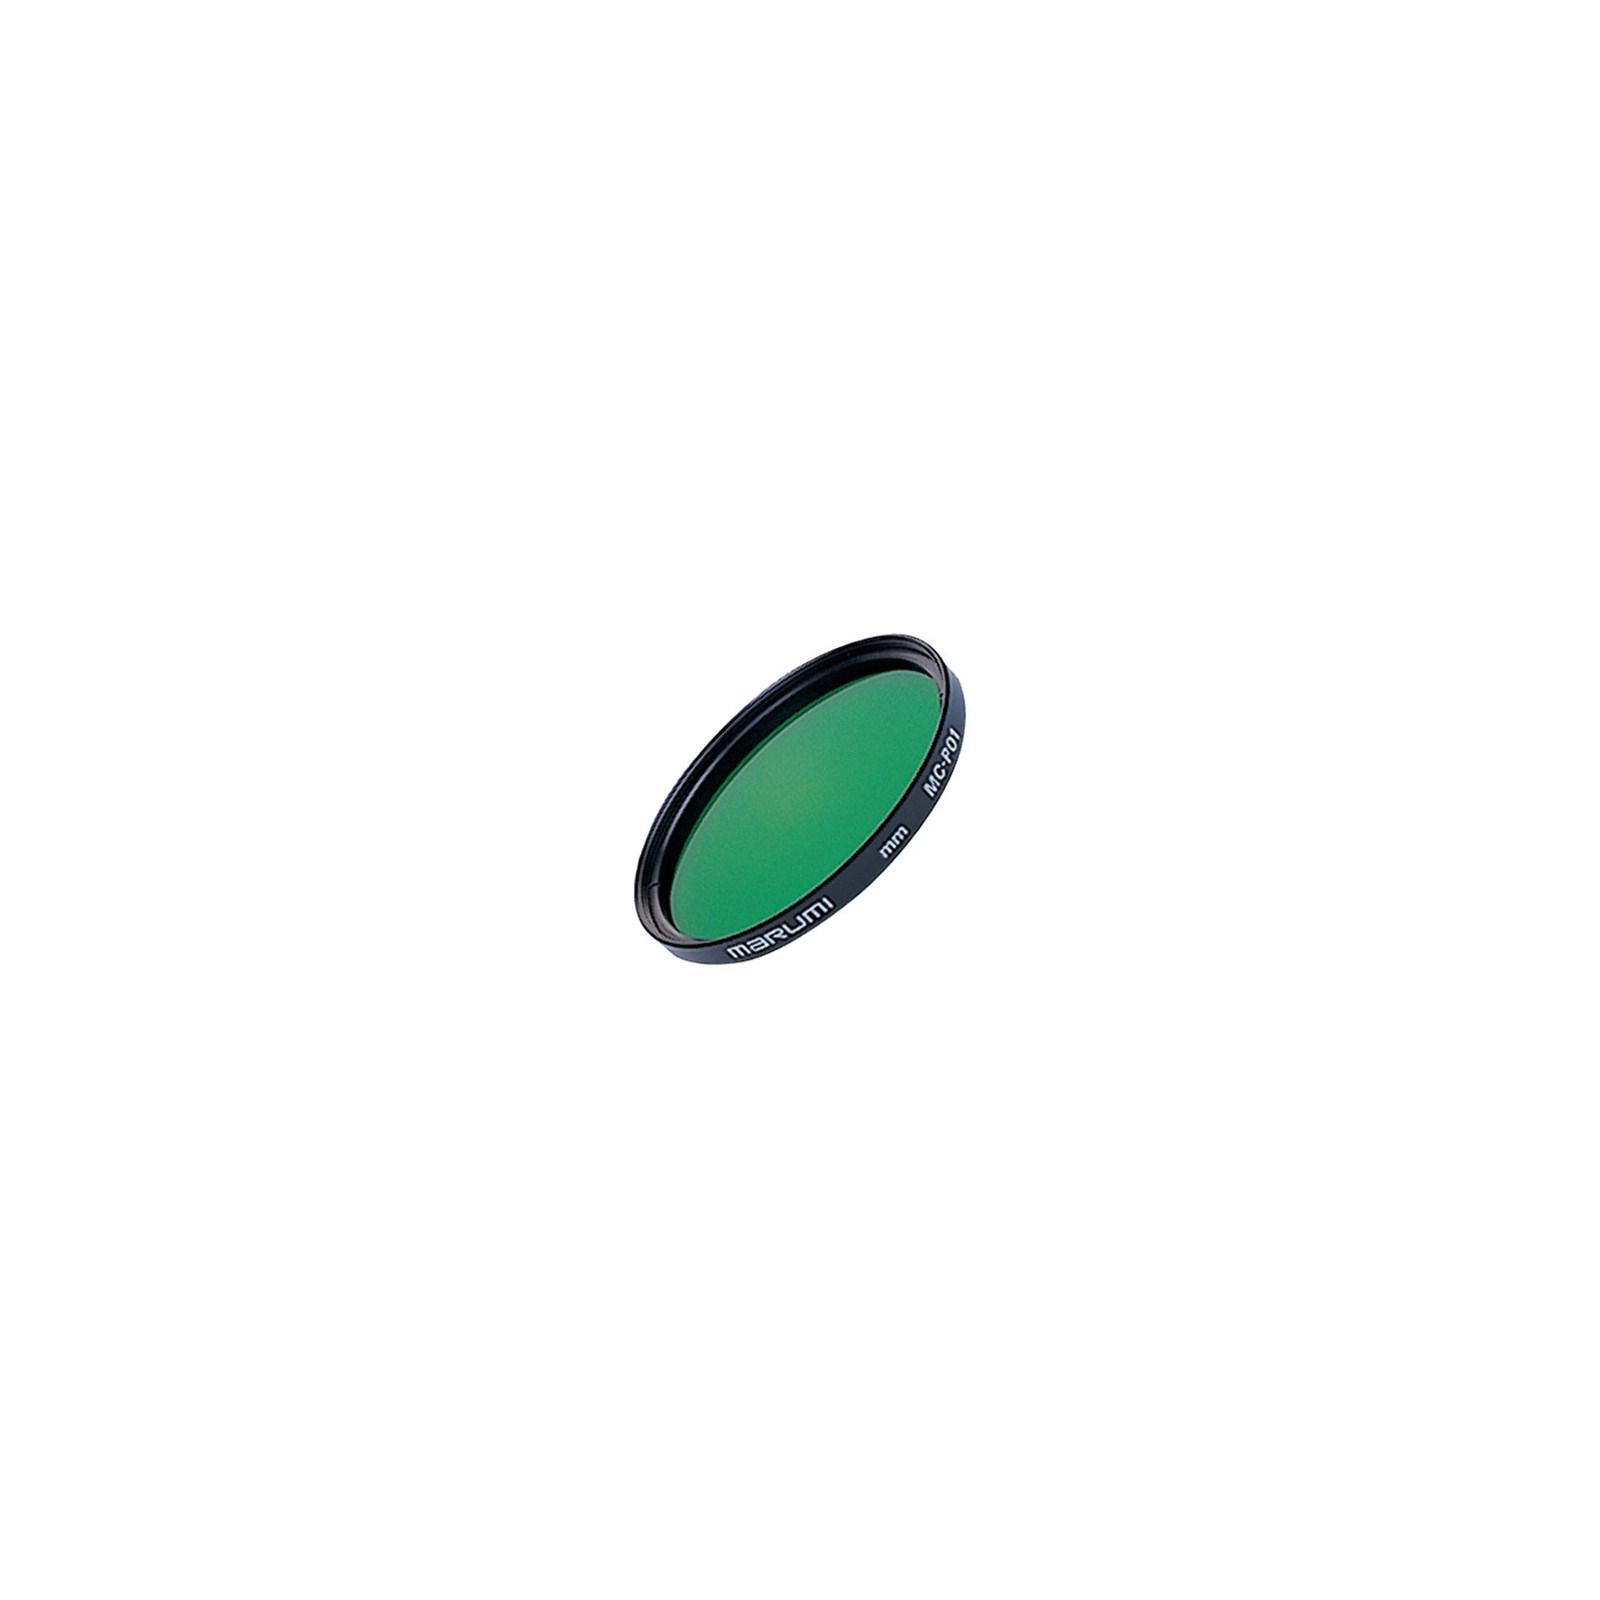 Светофильтр Marumi PO1 (green) 72mm